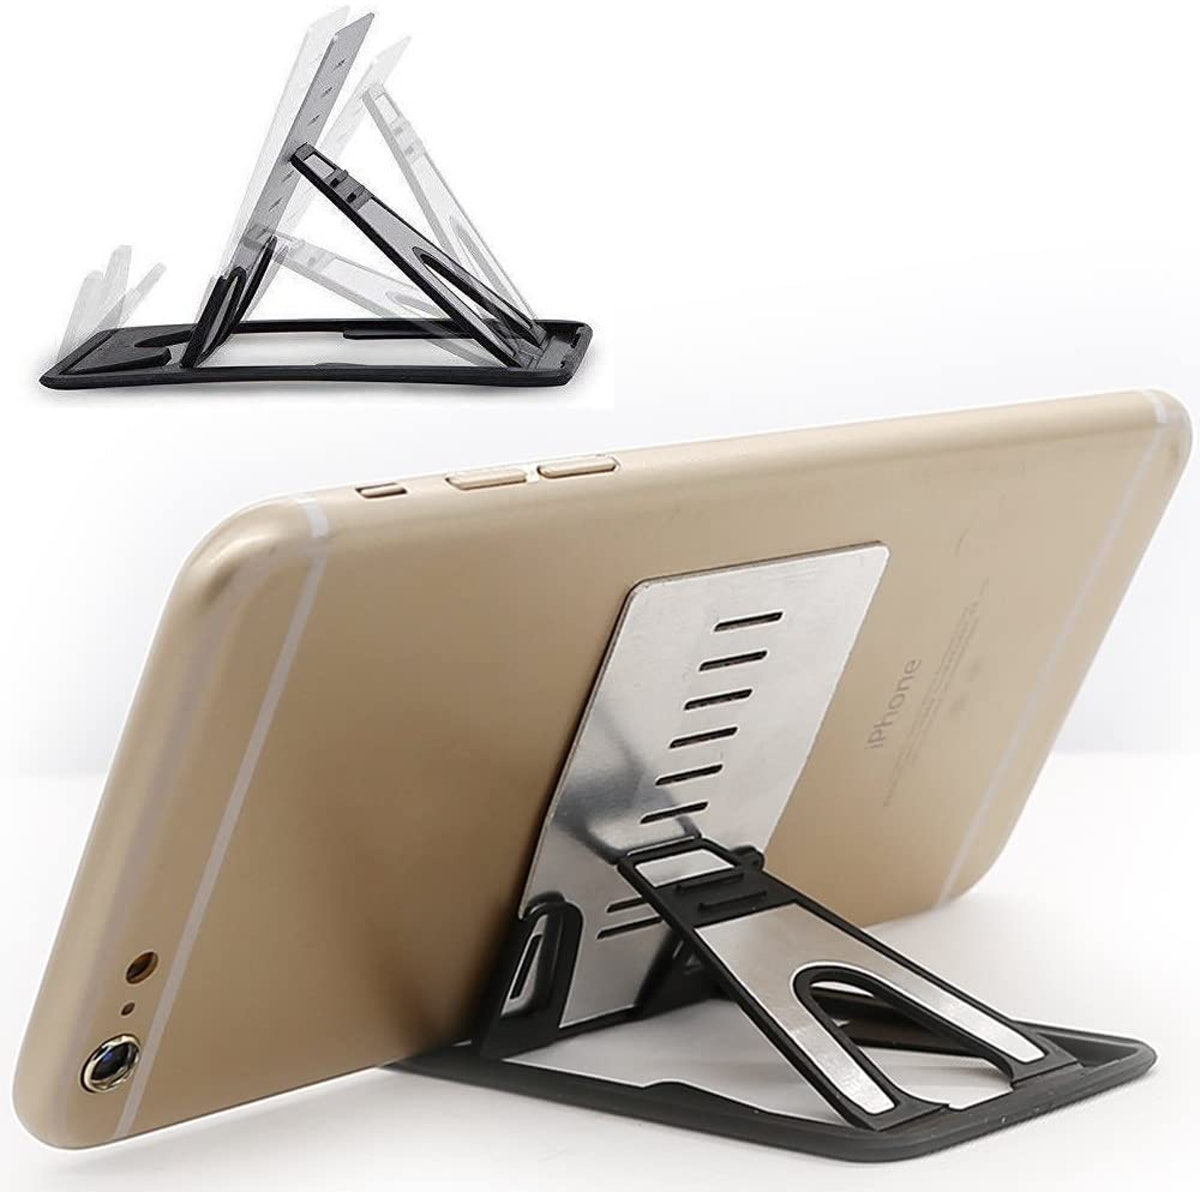 iMangoo Cell Phone Kickstand